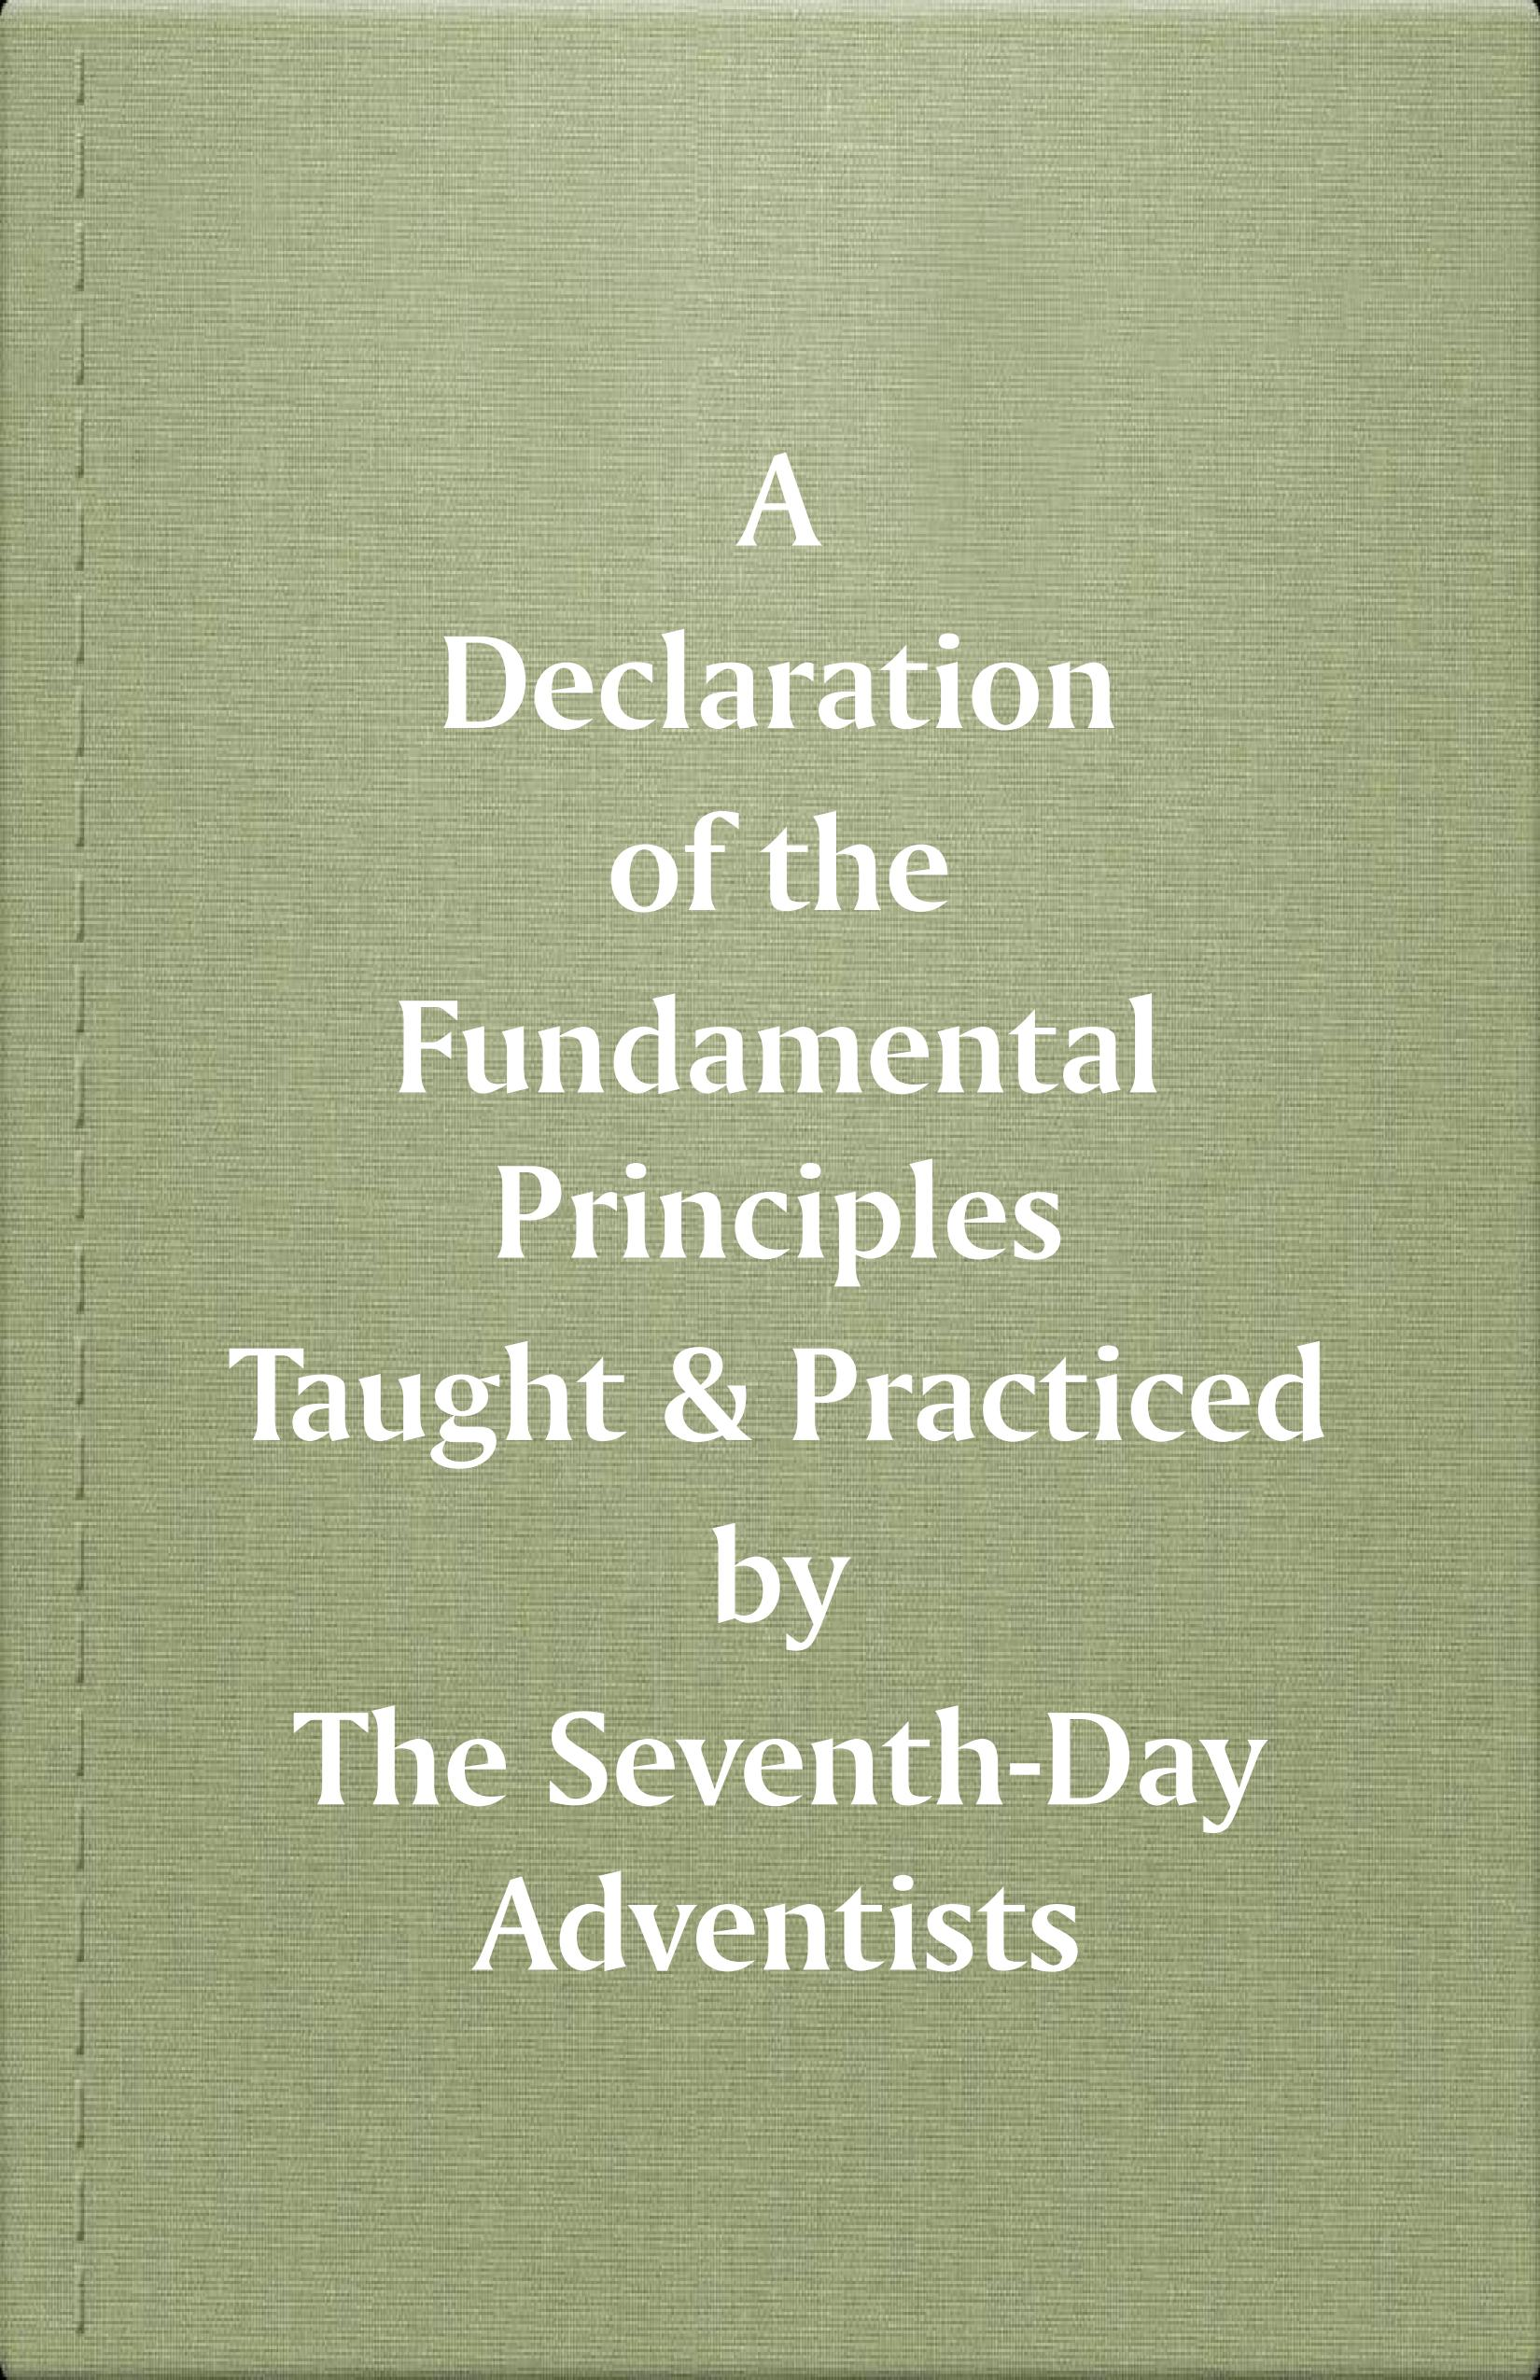 1872 and 1889 SDA Fundamental Beliefs